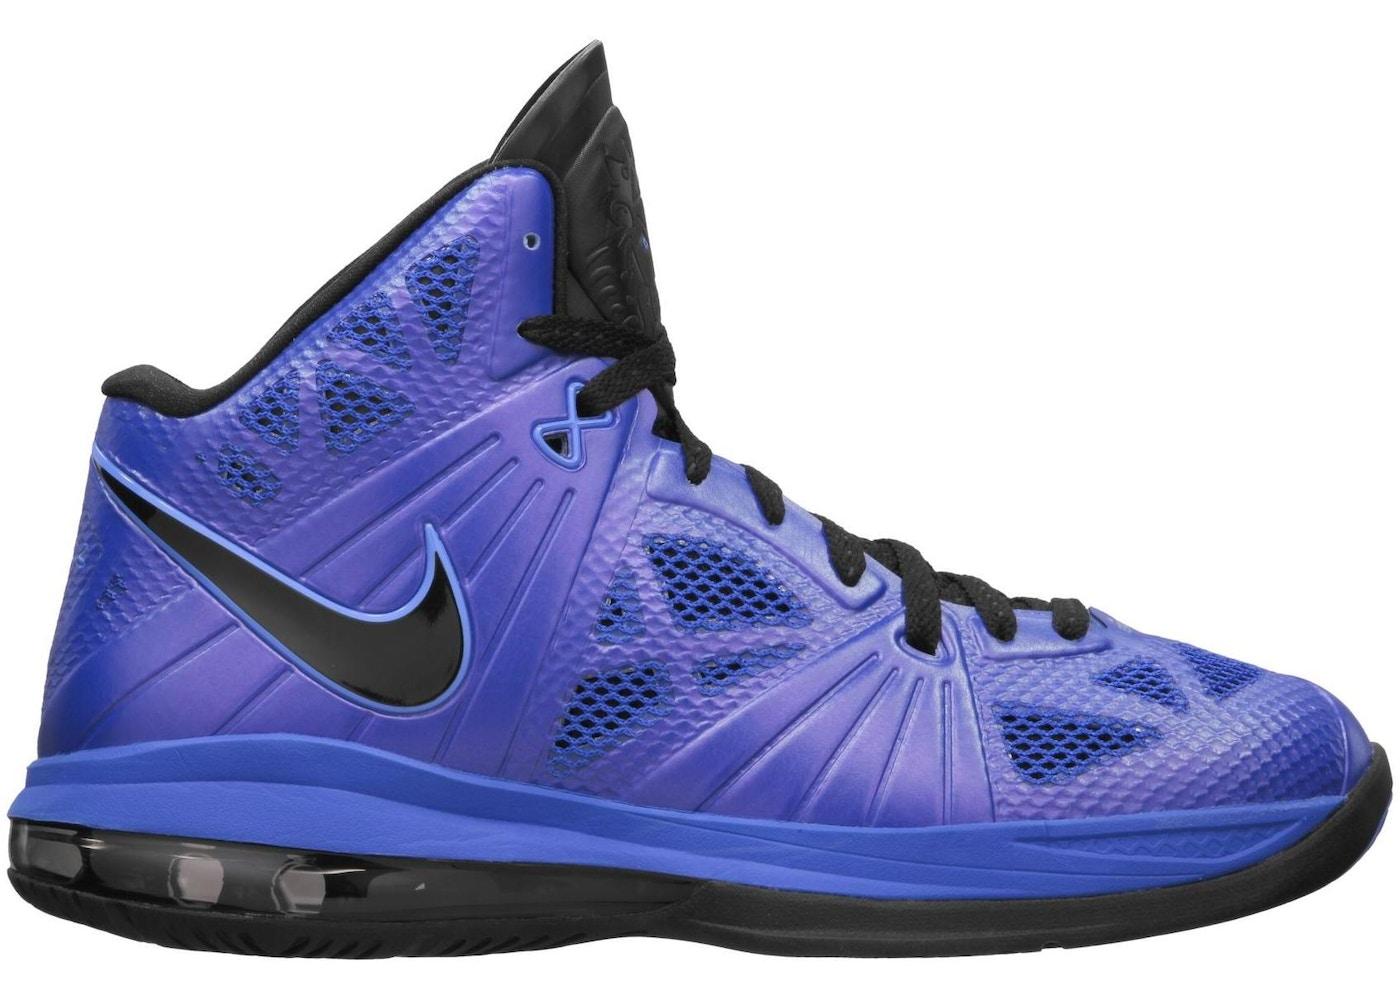 87c327bca7c1 Buy Nike LeBron 8 Shoes   Deadstock Sneakers